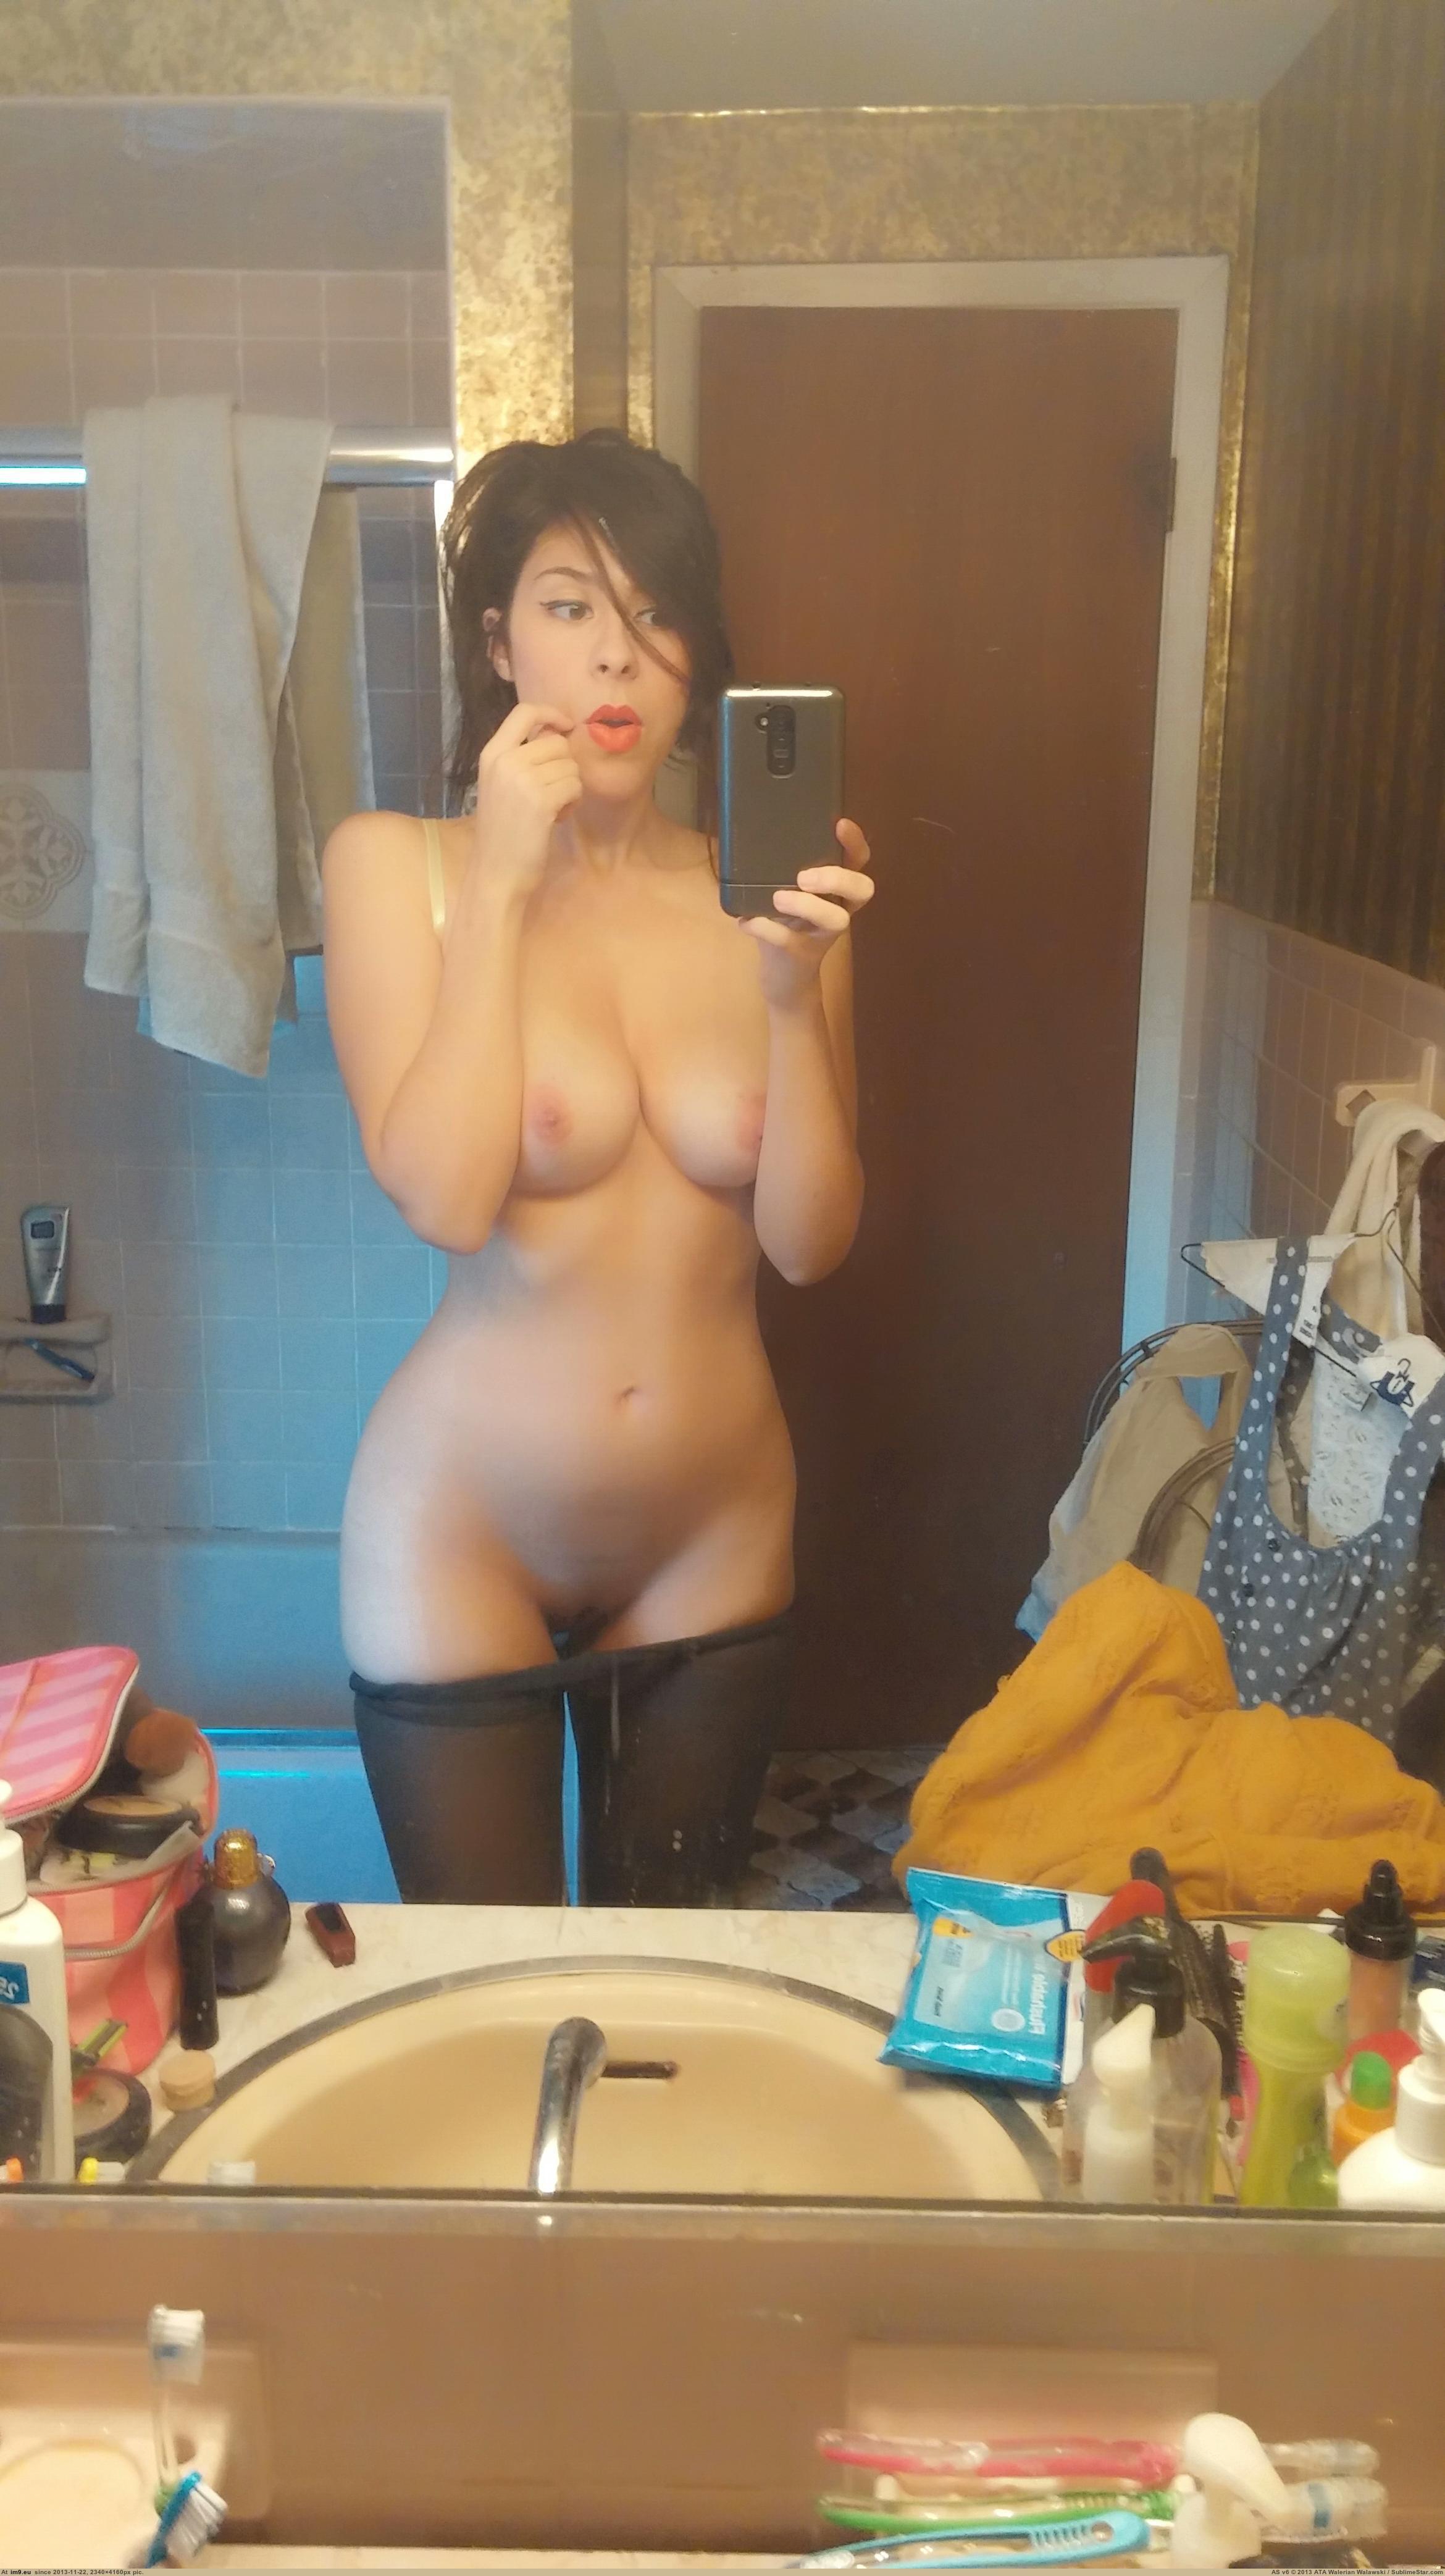 amateur-girl-boobs-selfshot-in-mirror-nude-15